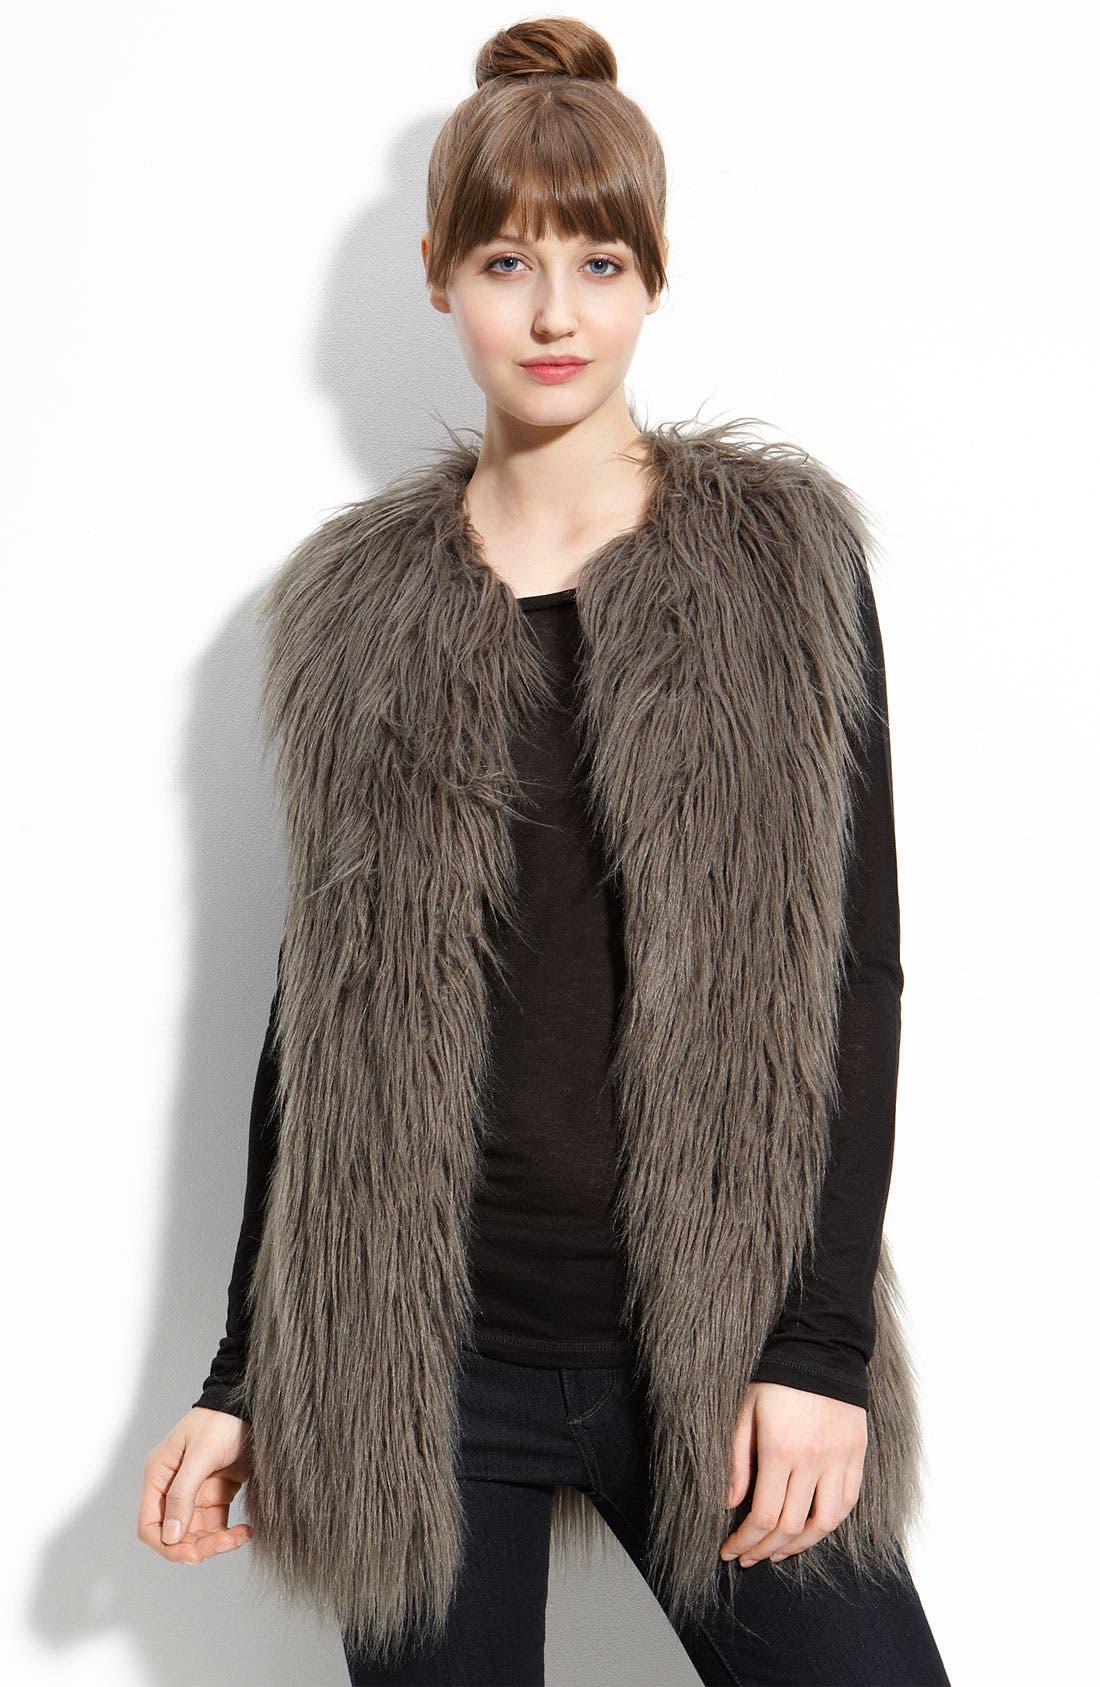 Alternate Image 1 Selected - Hawke & Co. Faux Fur Vest (Nordstrom Exclusive)